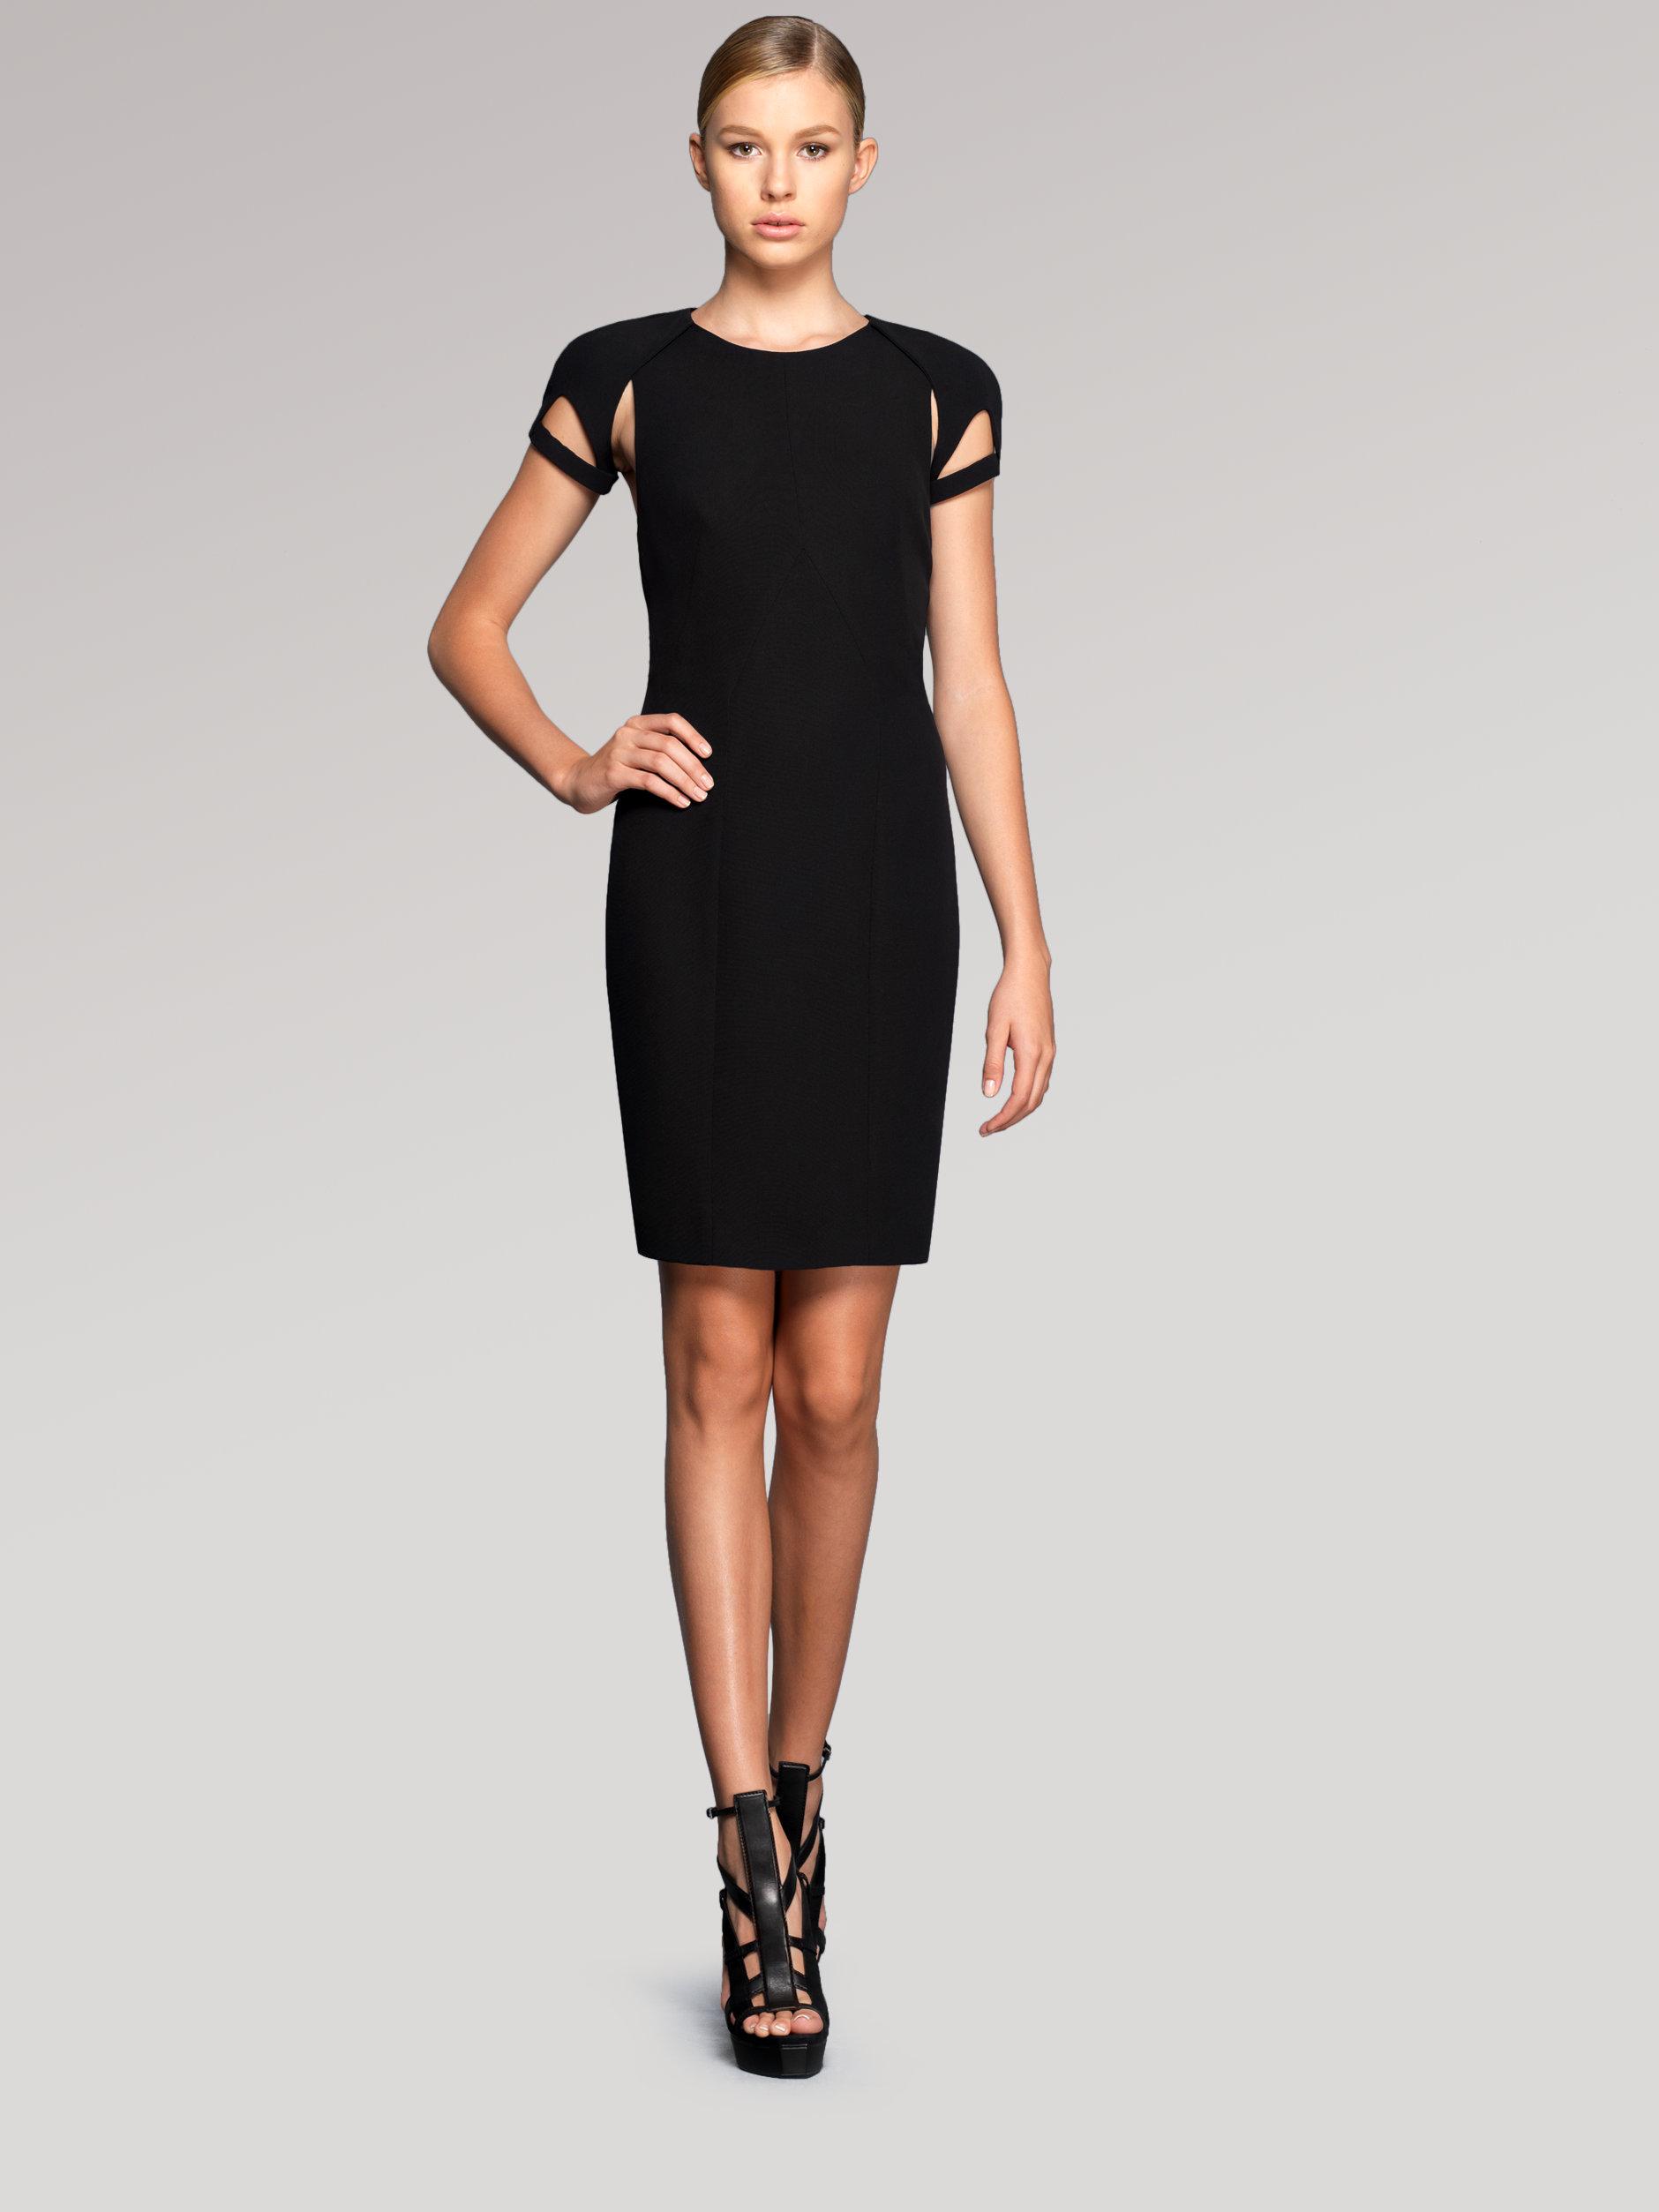 Laundry By Design Black Dress